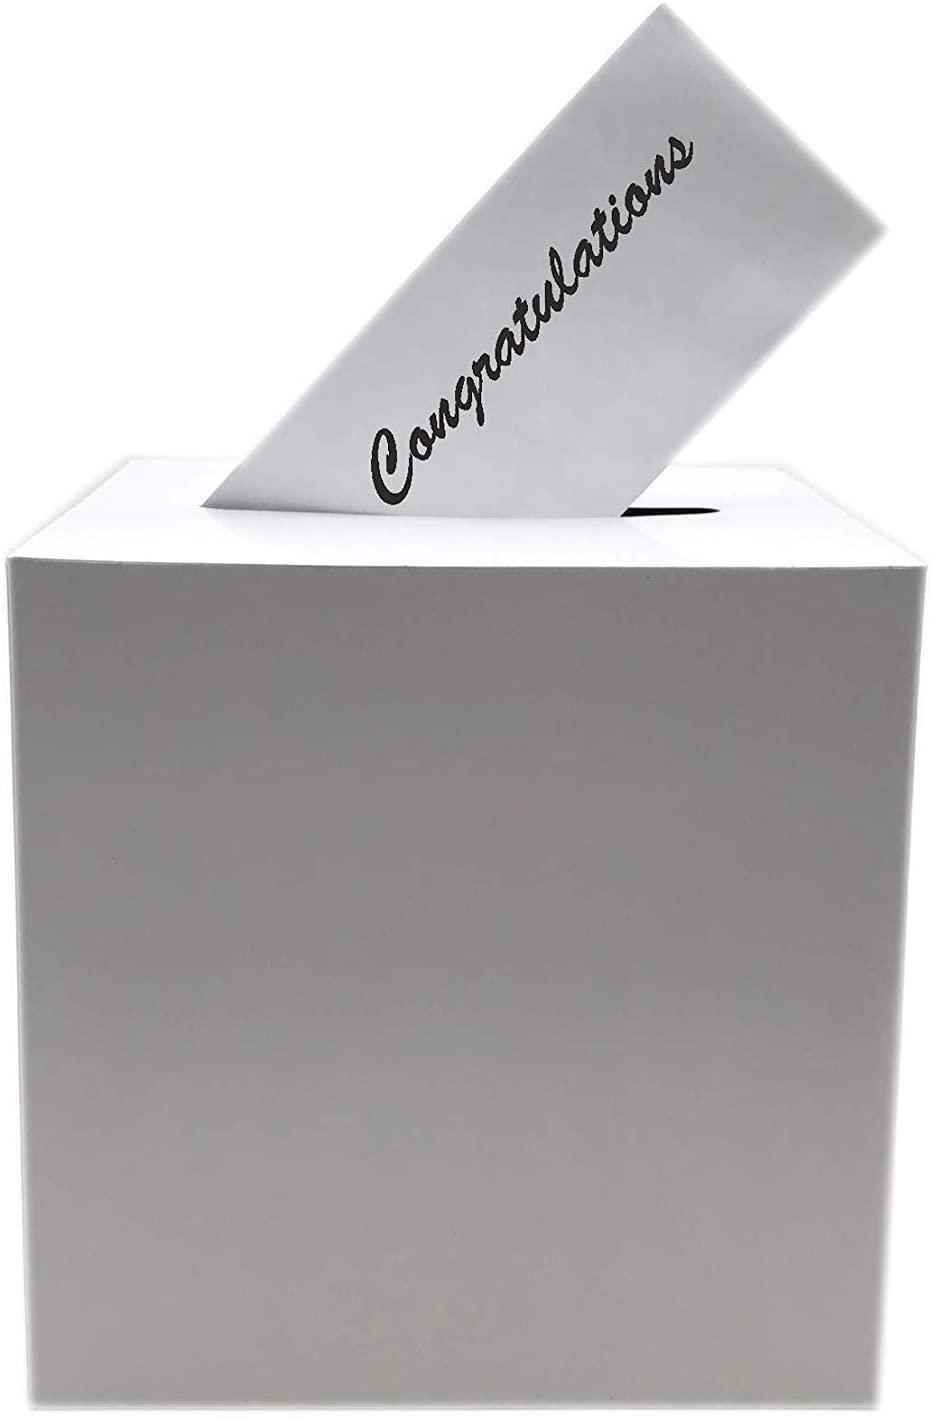 Tytroy White Money Box Keepsake Wedding Reception Decoration Wishing Well Party Favor (1 pc)